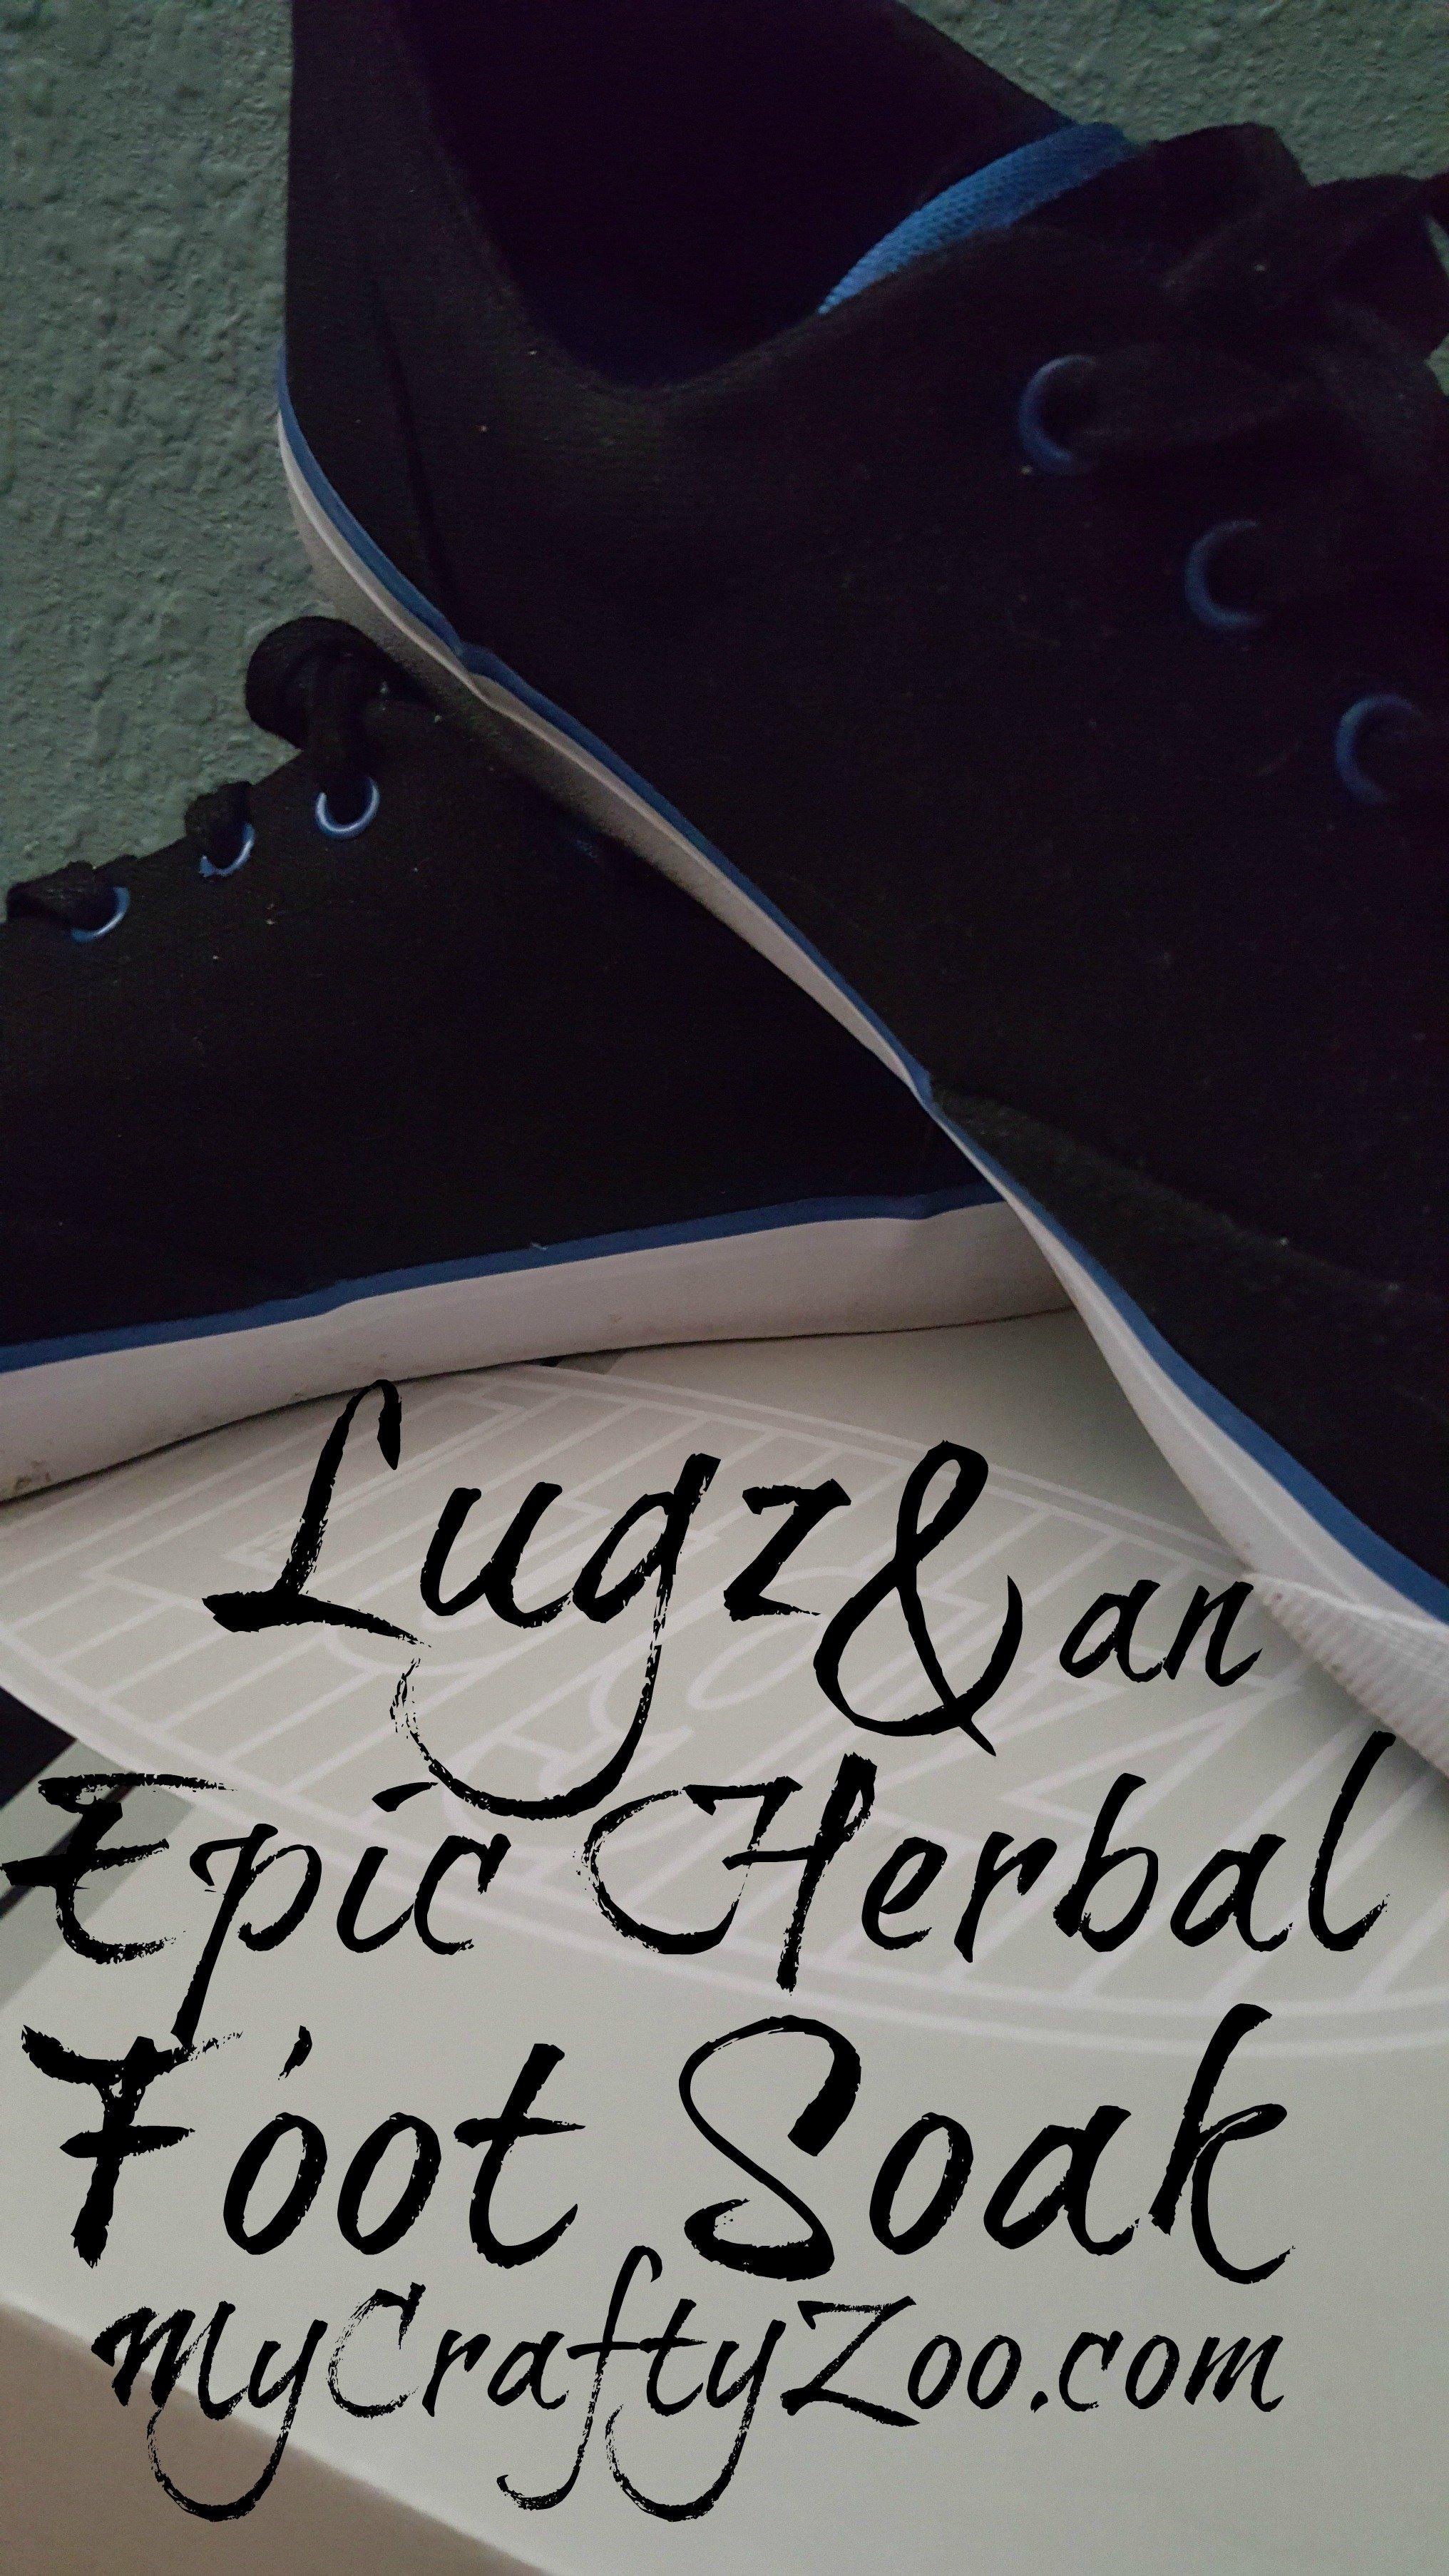 Feeling Lucky? @LugzNYC & an Herbal Foot Soak!